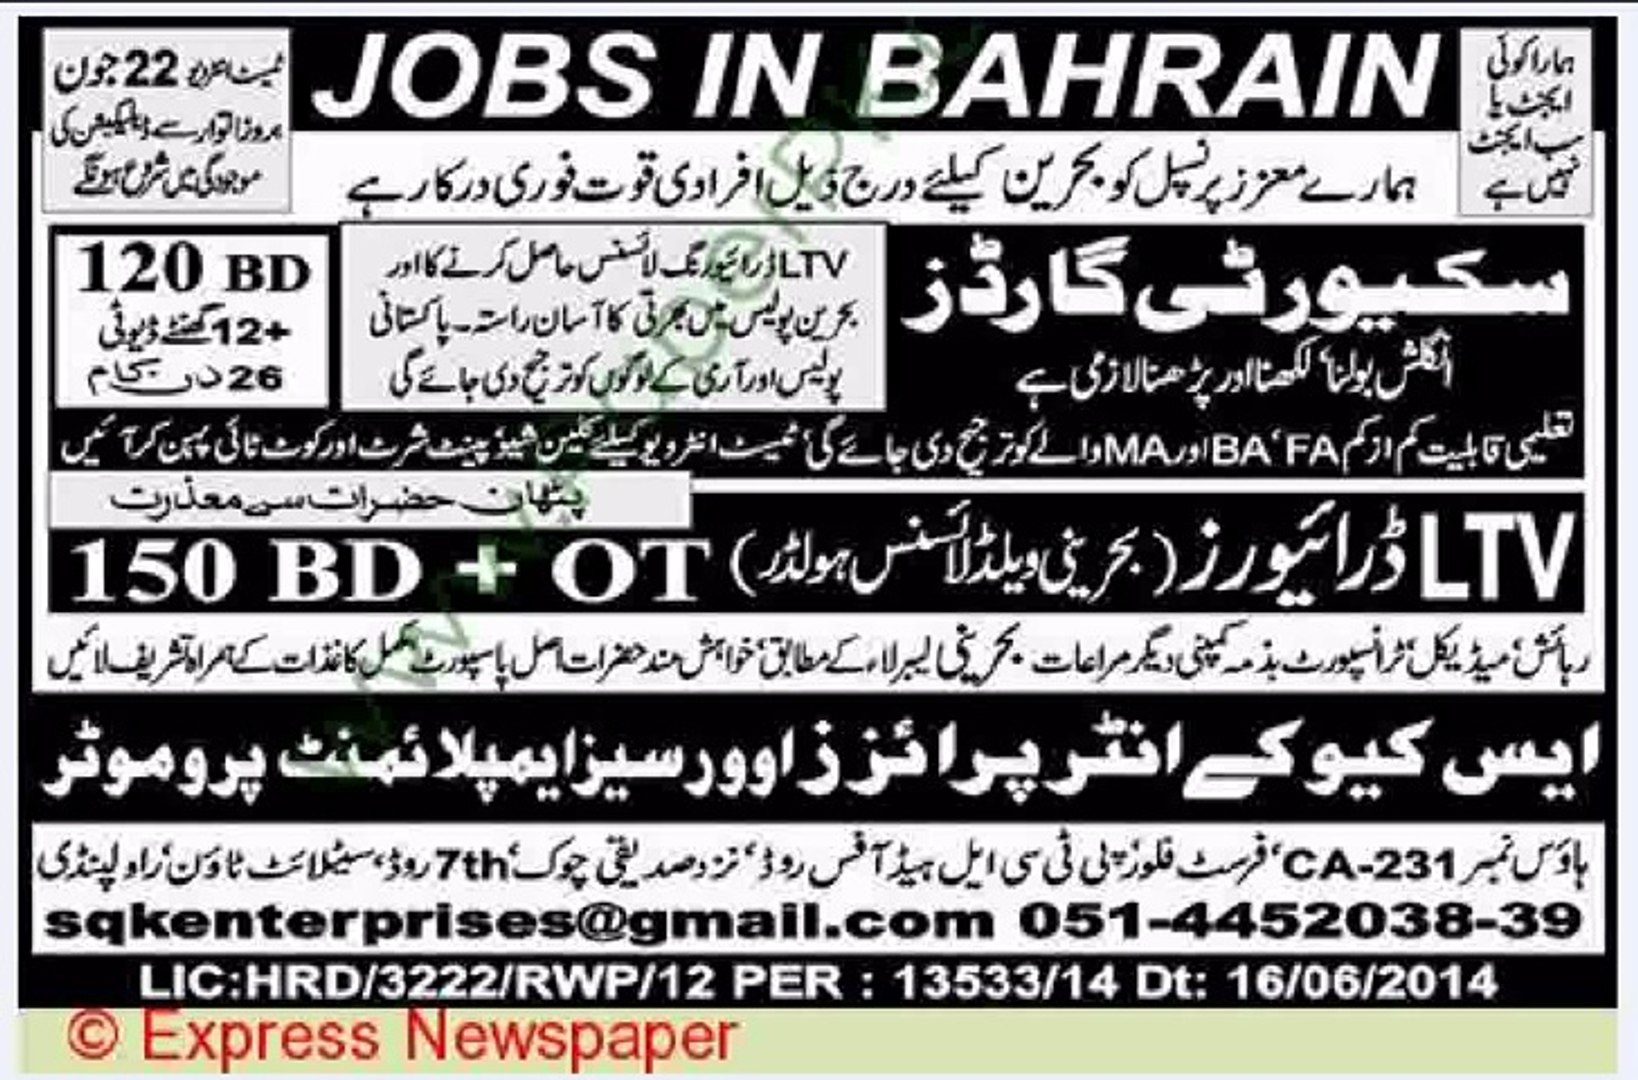 security-guard-driver-jobs-in-bahrain